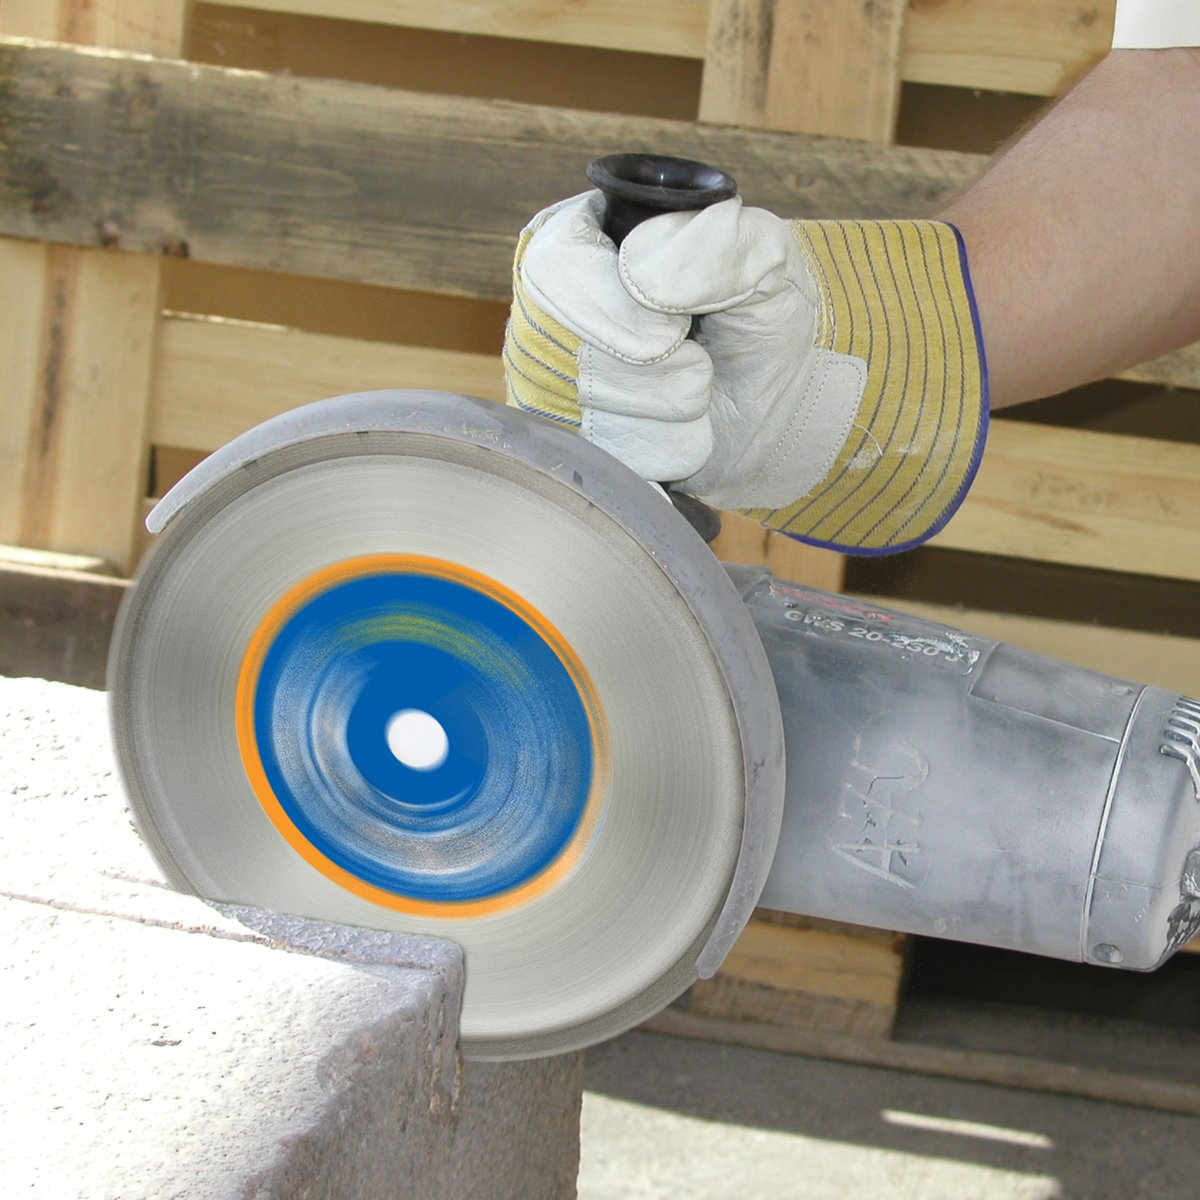 S/&R Diamond Cutting Disc 230x22,2 mm Blade for angle grinder Masonry discs Stone Brick universal use: Concrete